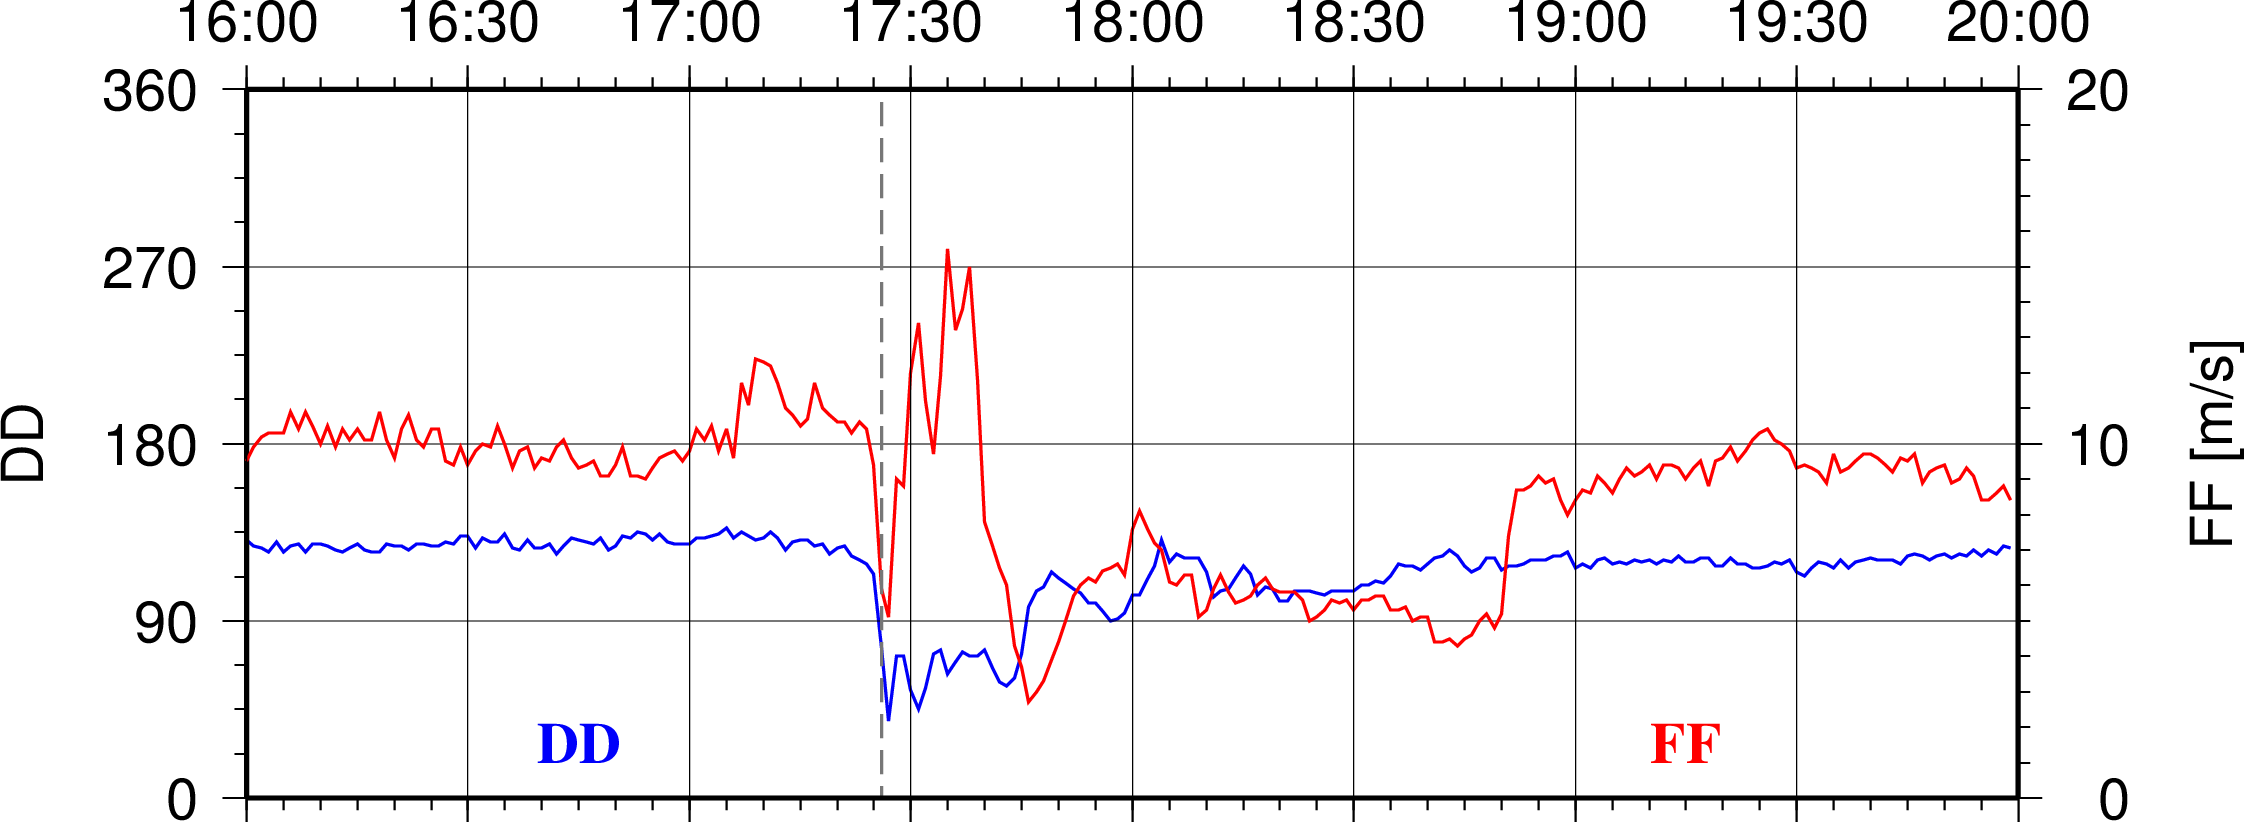 Image 8: Wind variation during event